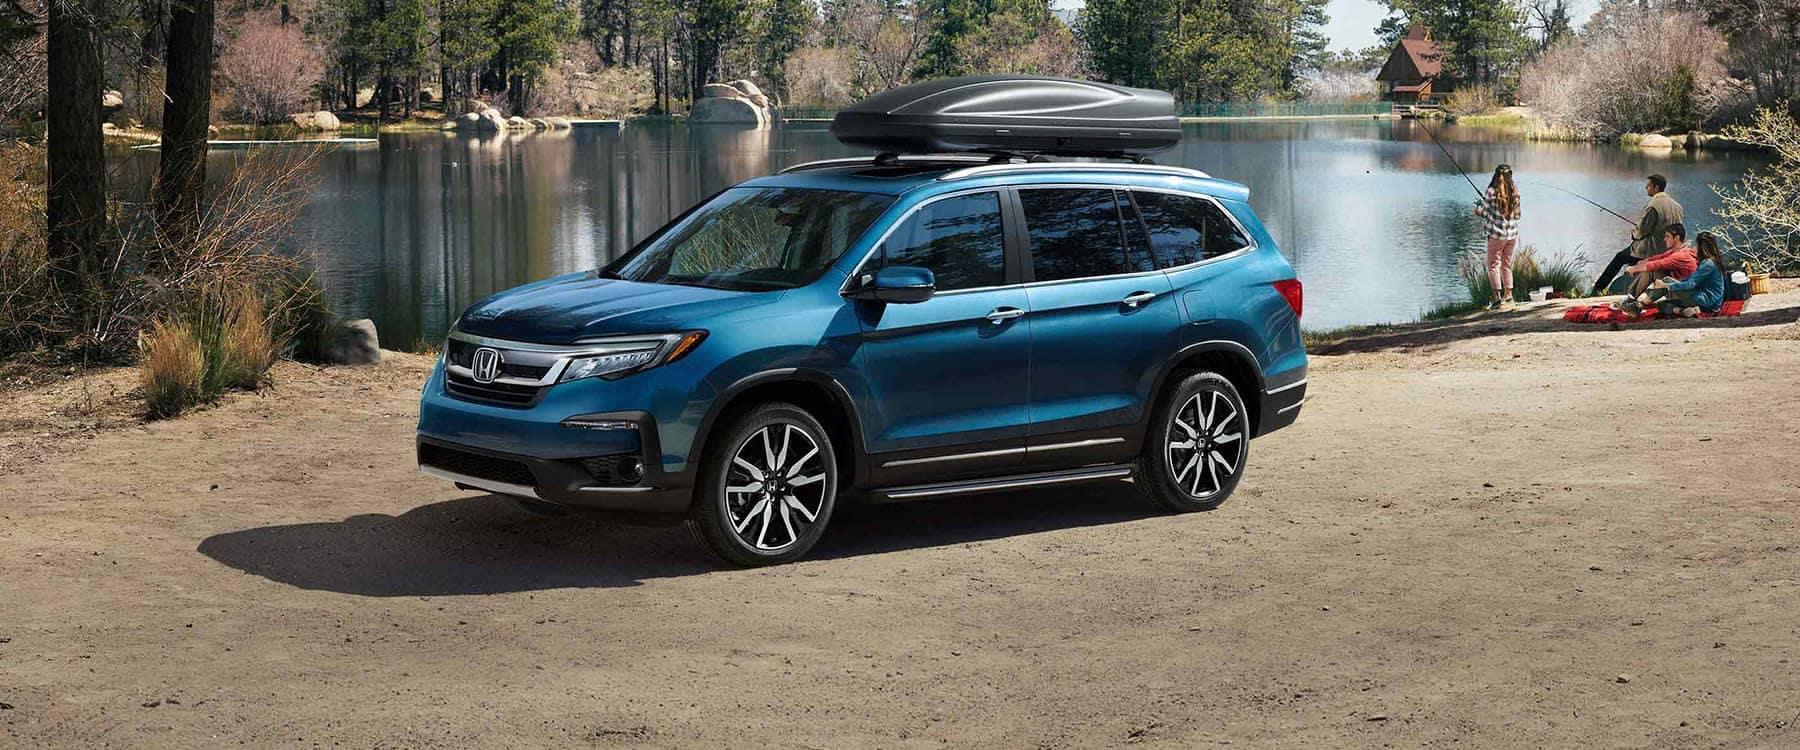 2019 Honda Pilot Parked at Lake with Family Fishing Banner